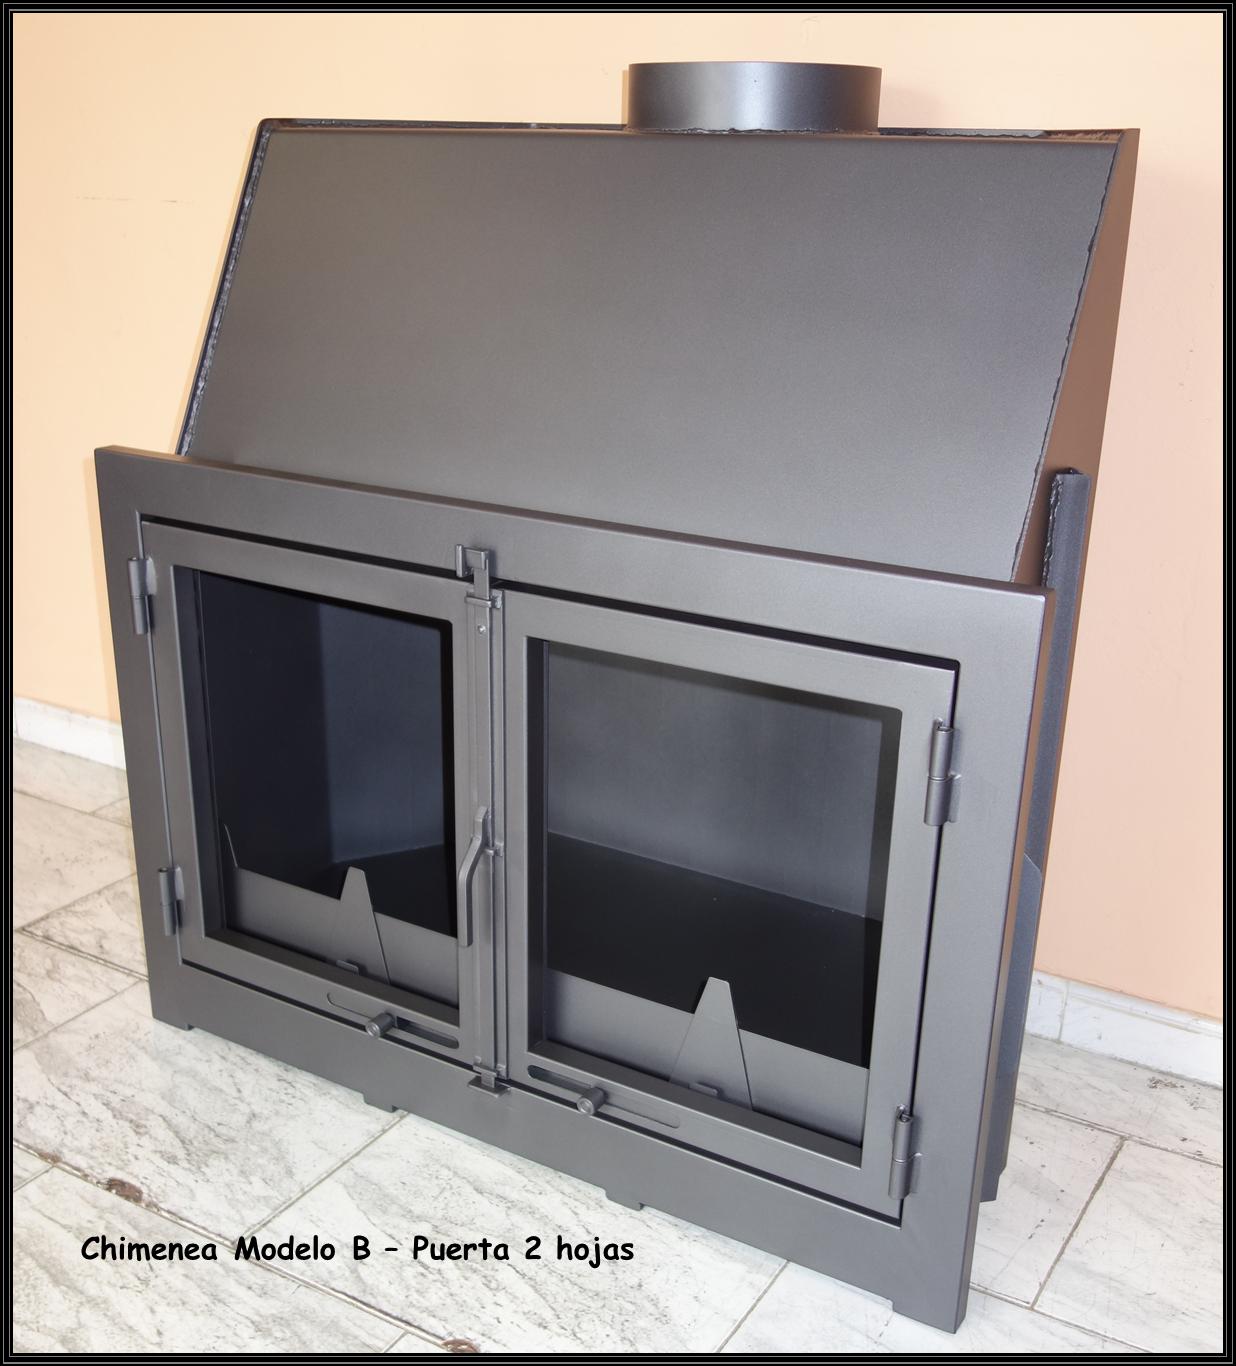 Chimeneas sierra chimenea met lica modelo b con puerta for Puertas para chimeneas